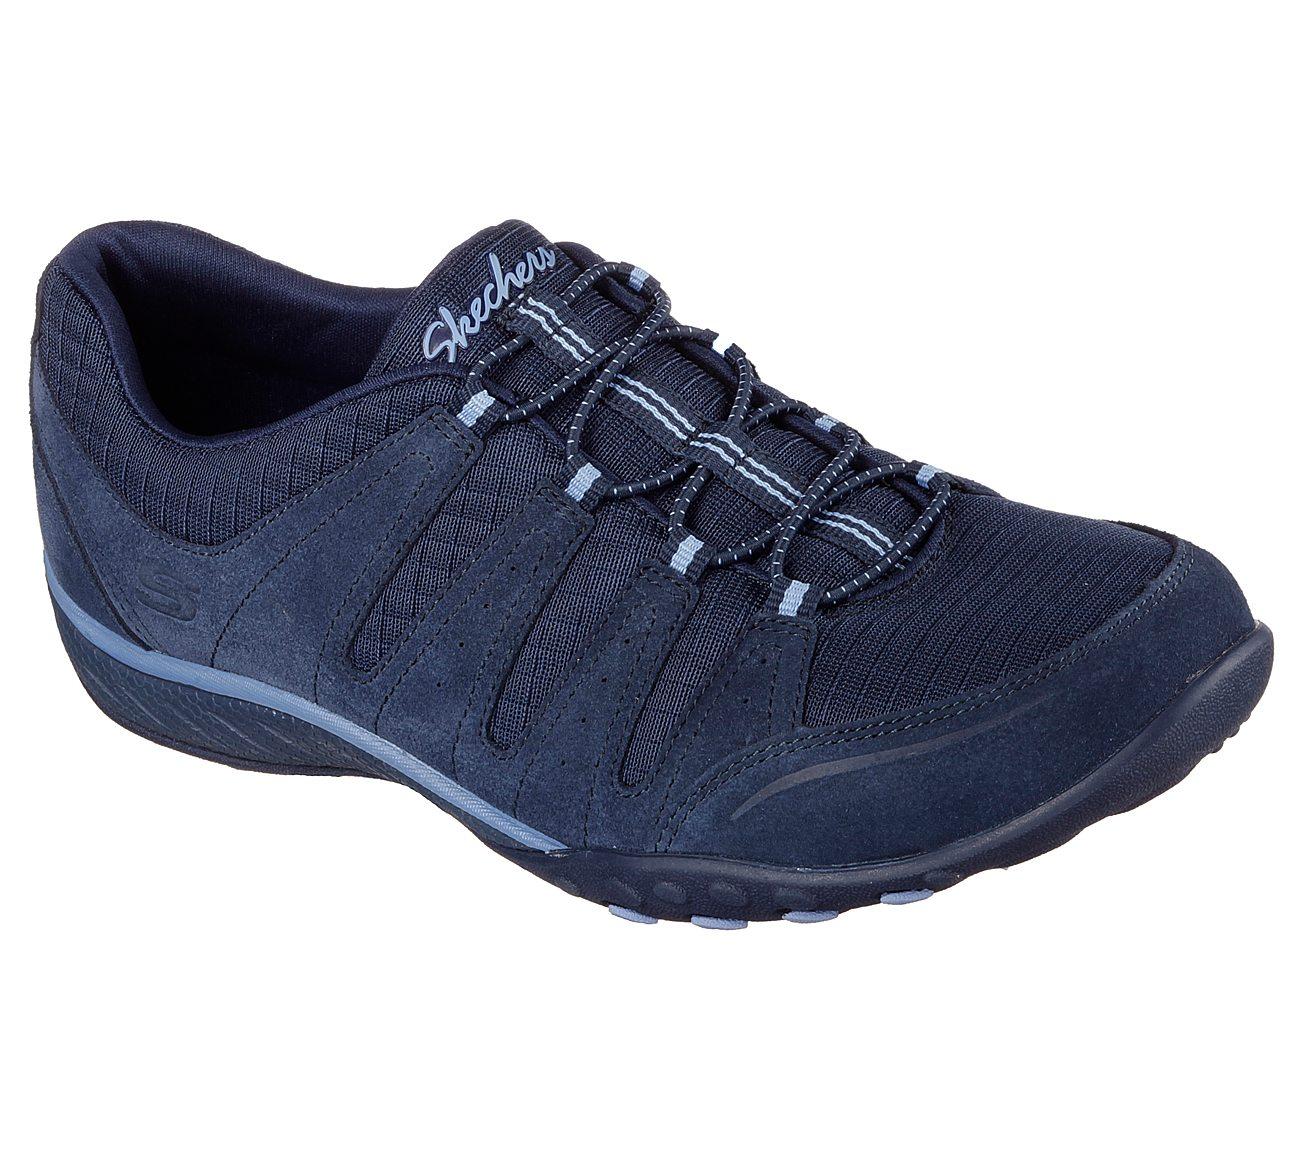 Skechers Breathe Easy Imagine, Women's Low Top Sneakers